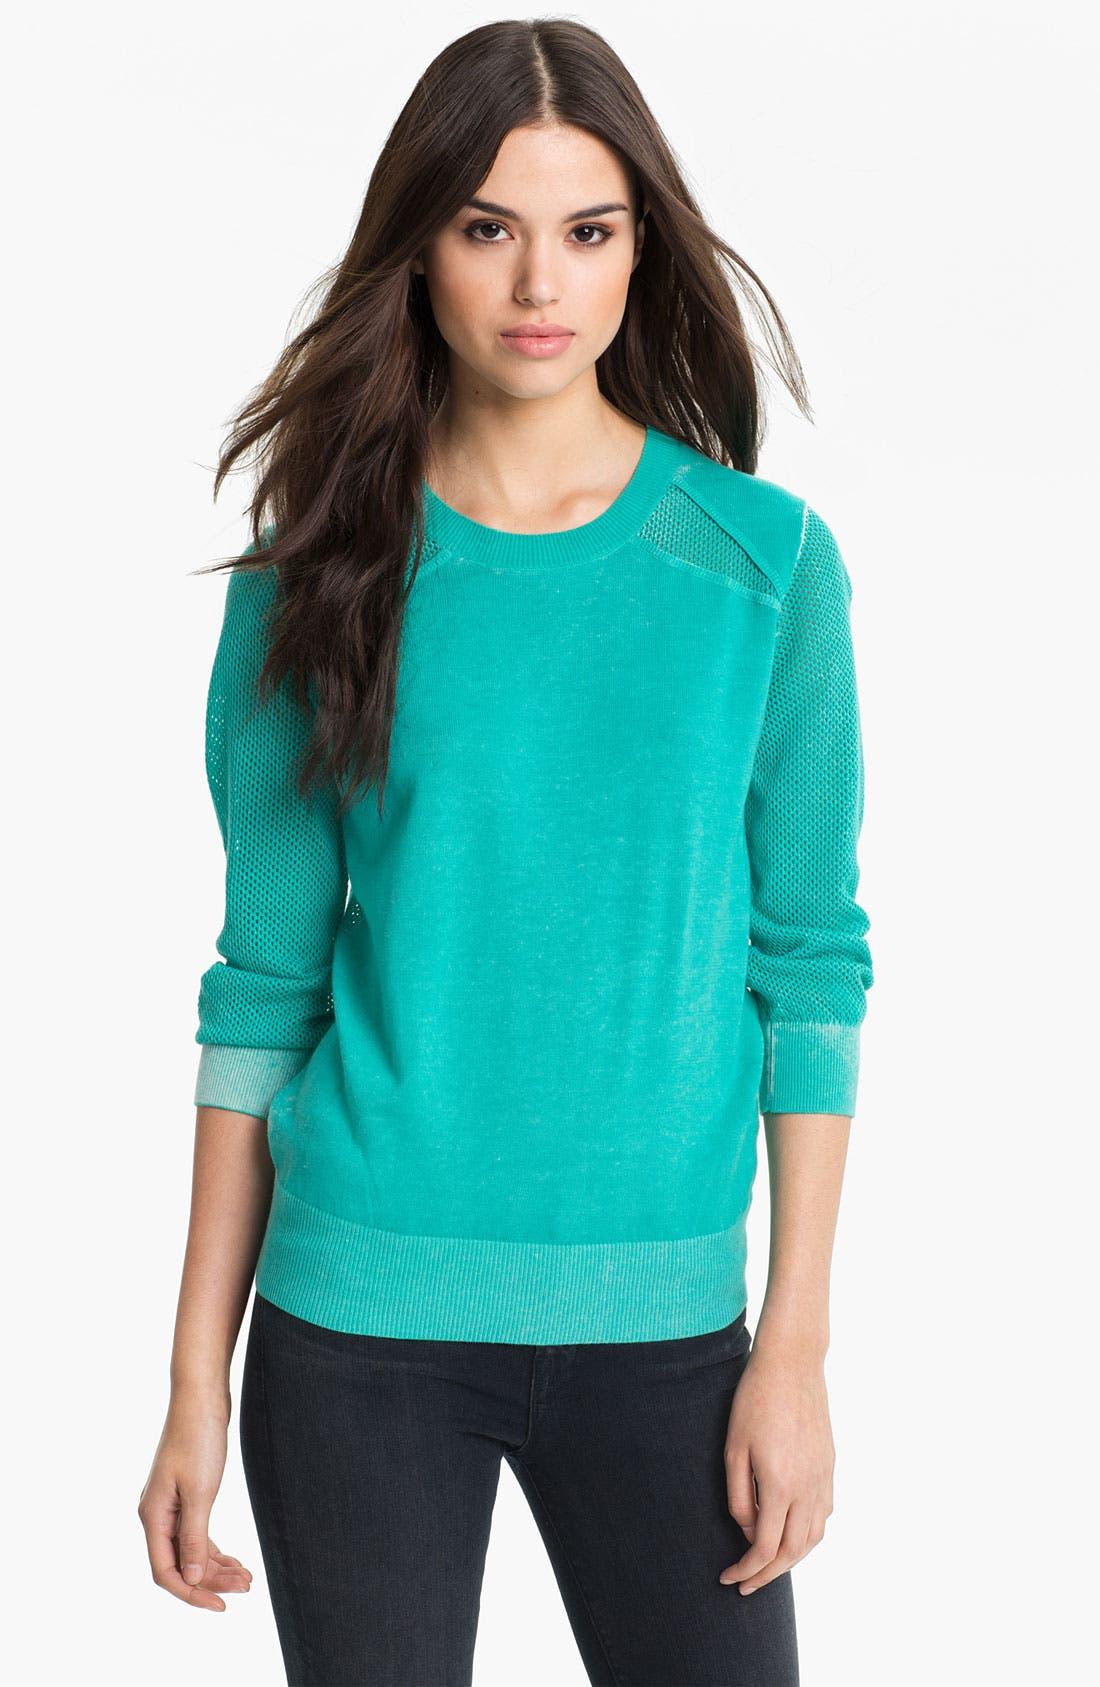 Alternate Image 1 Selected - Rebecca Minkoff 'Ontario' Mesh Panel Sweater